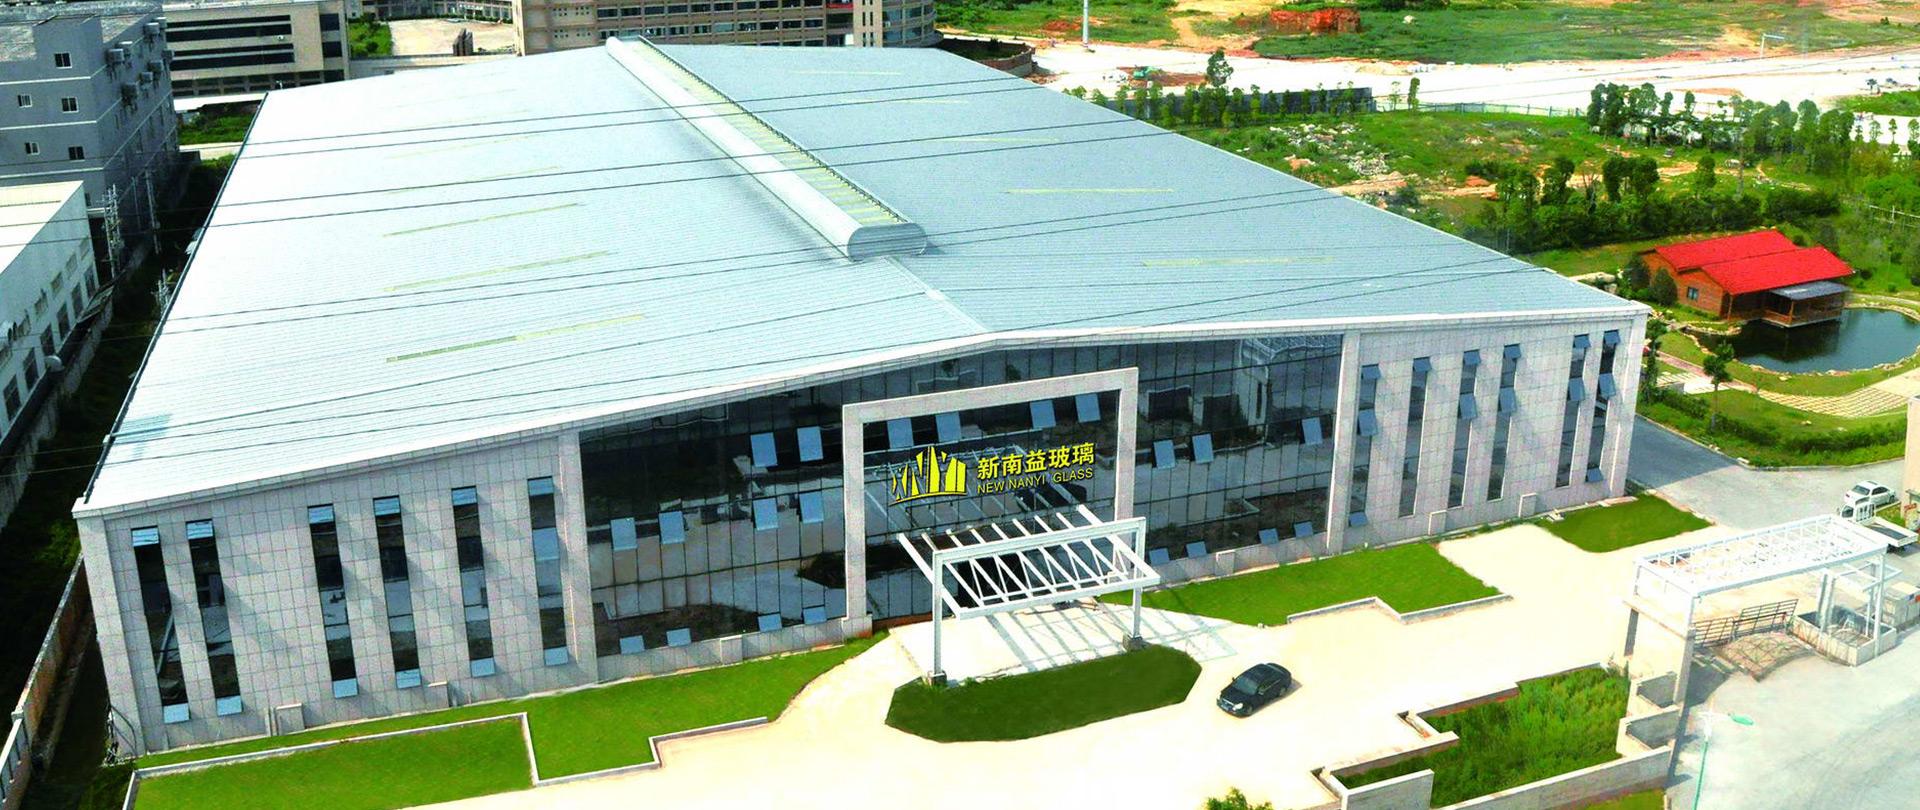 Jinjiang New Nanyi innovative glass co ltd.